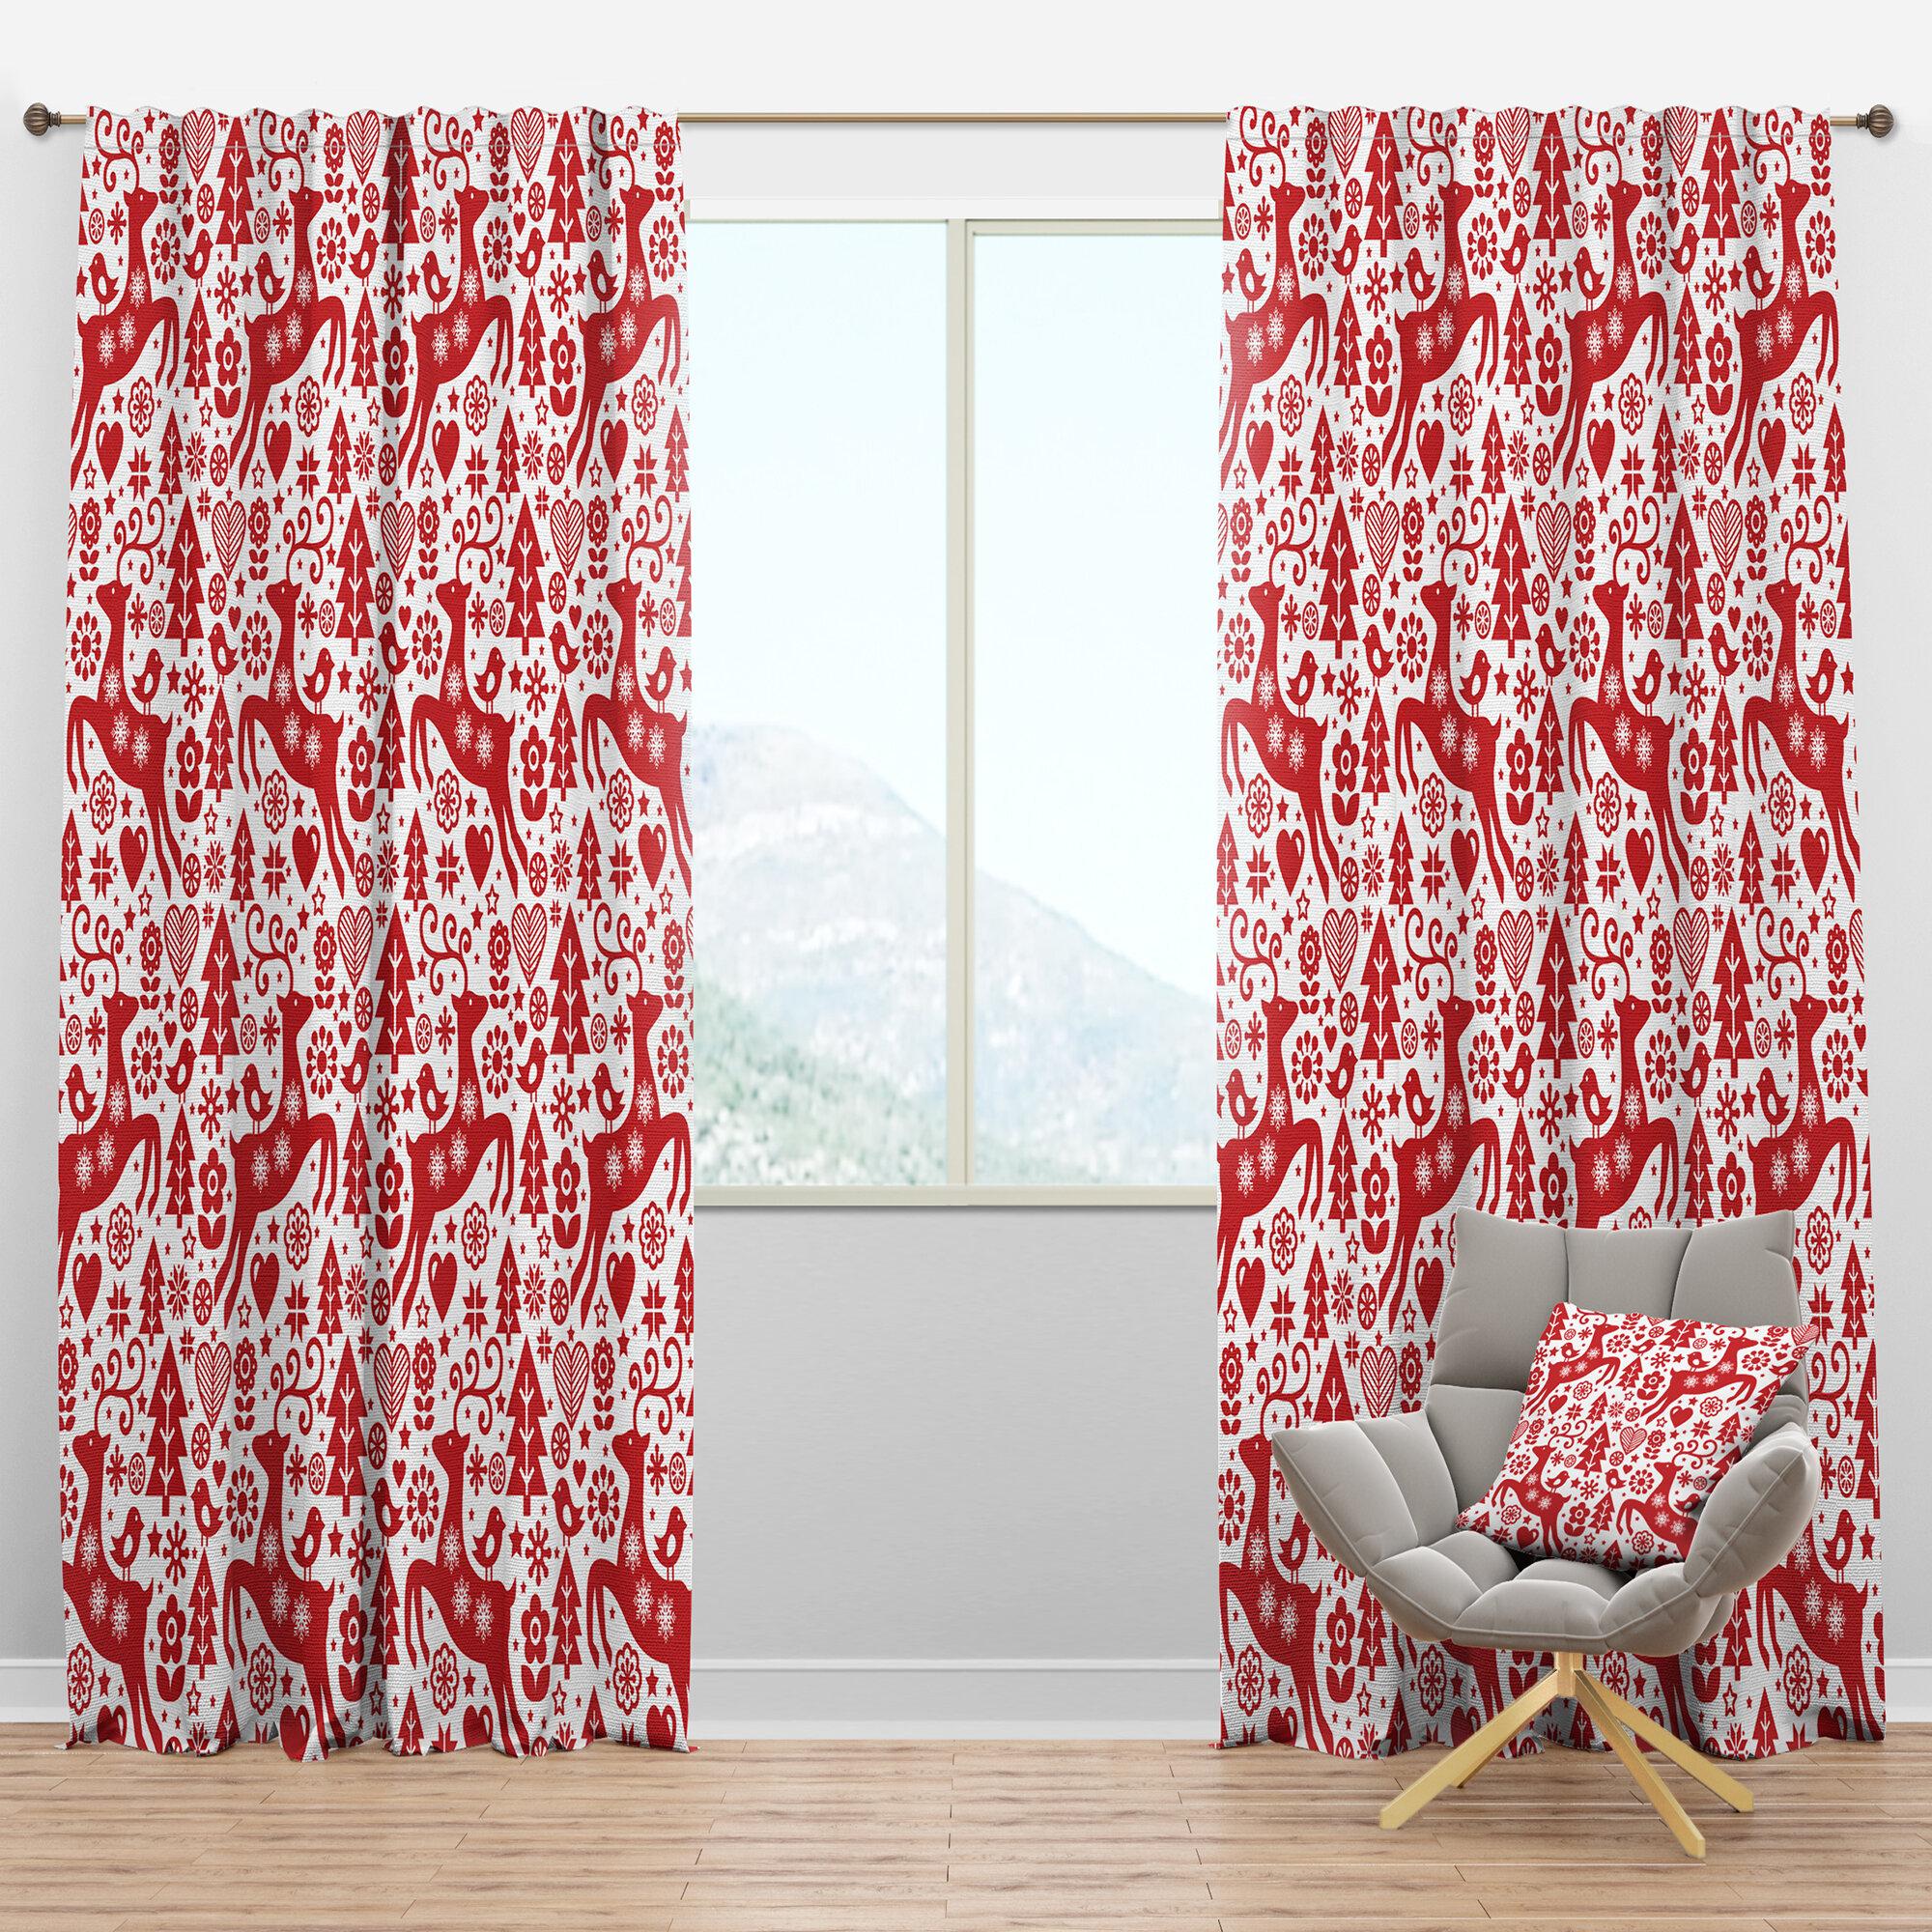 Designart Scandinavian Raindeed With Little Birds And Christmas Tree Floral Semi Sheer Thermal Rod Pocket Single Curtain Panel Wayfair